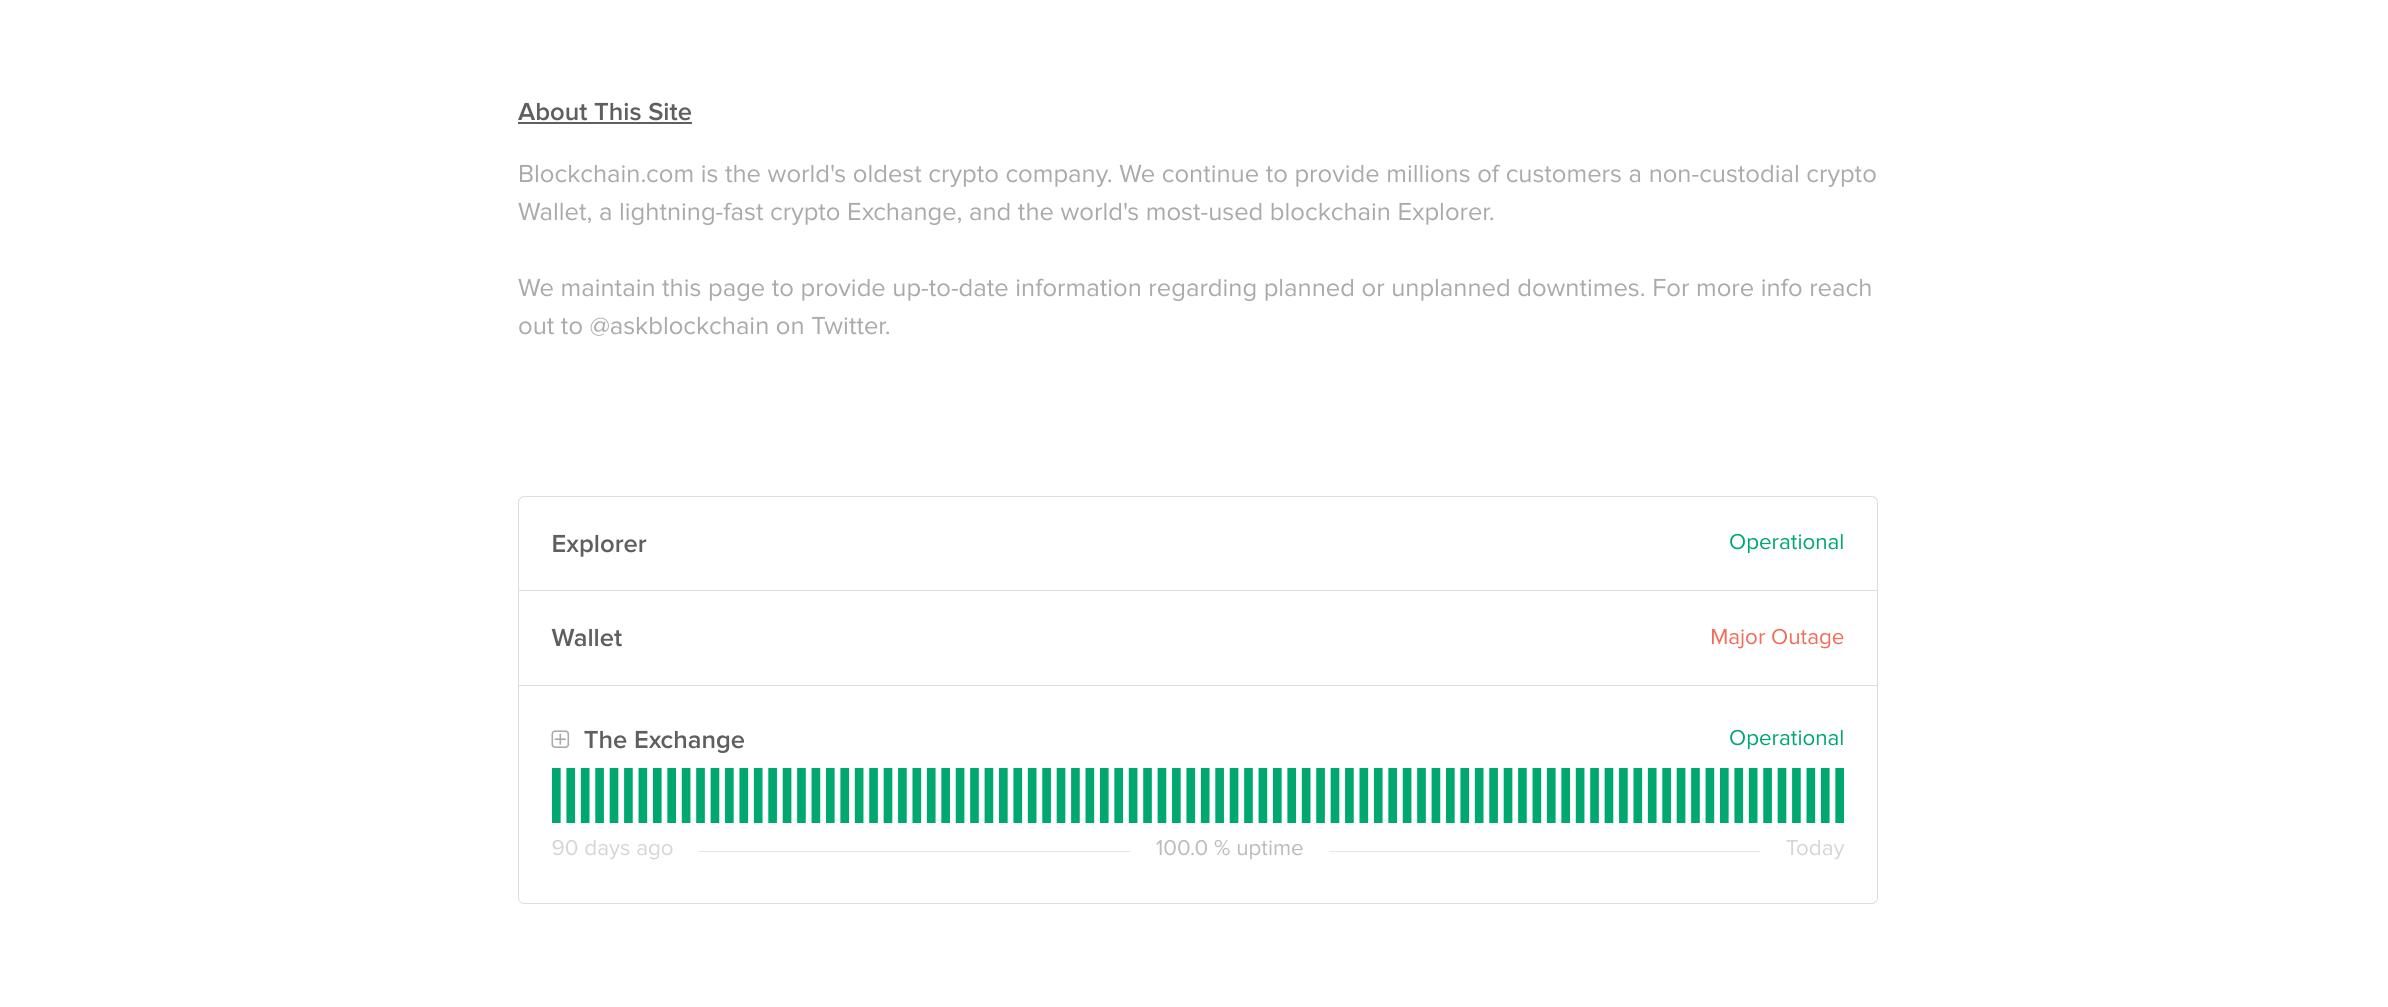 Blockchain.com - Major Wallet Outage